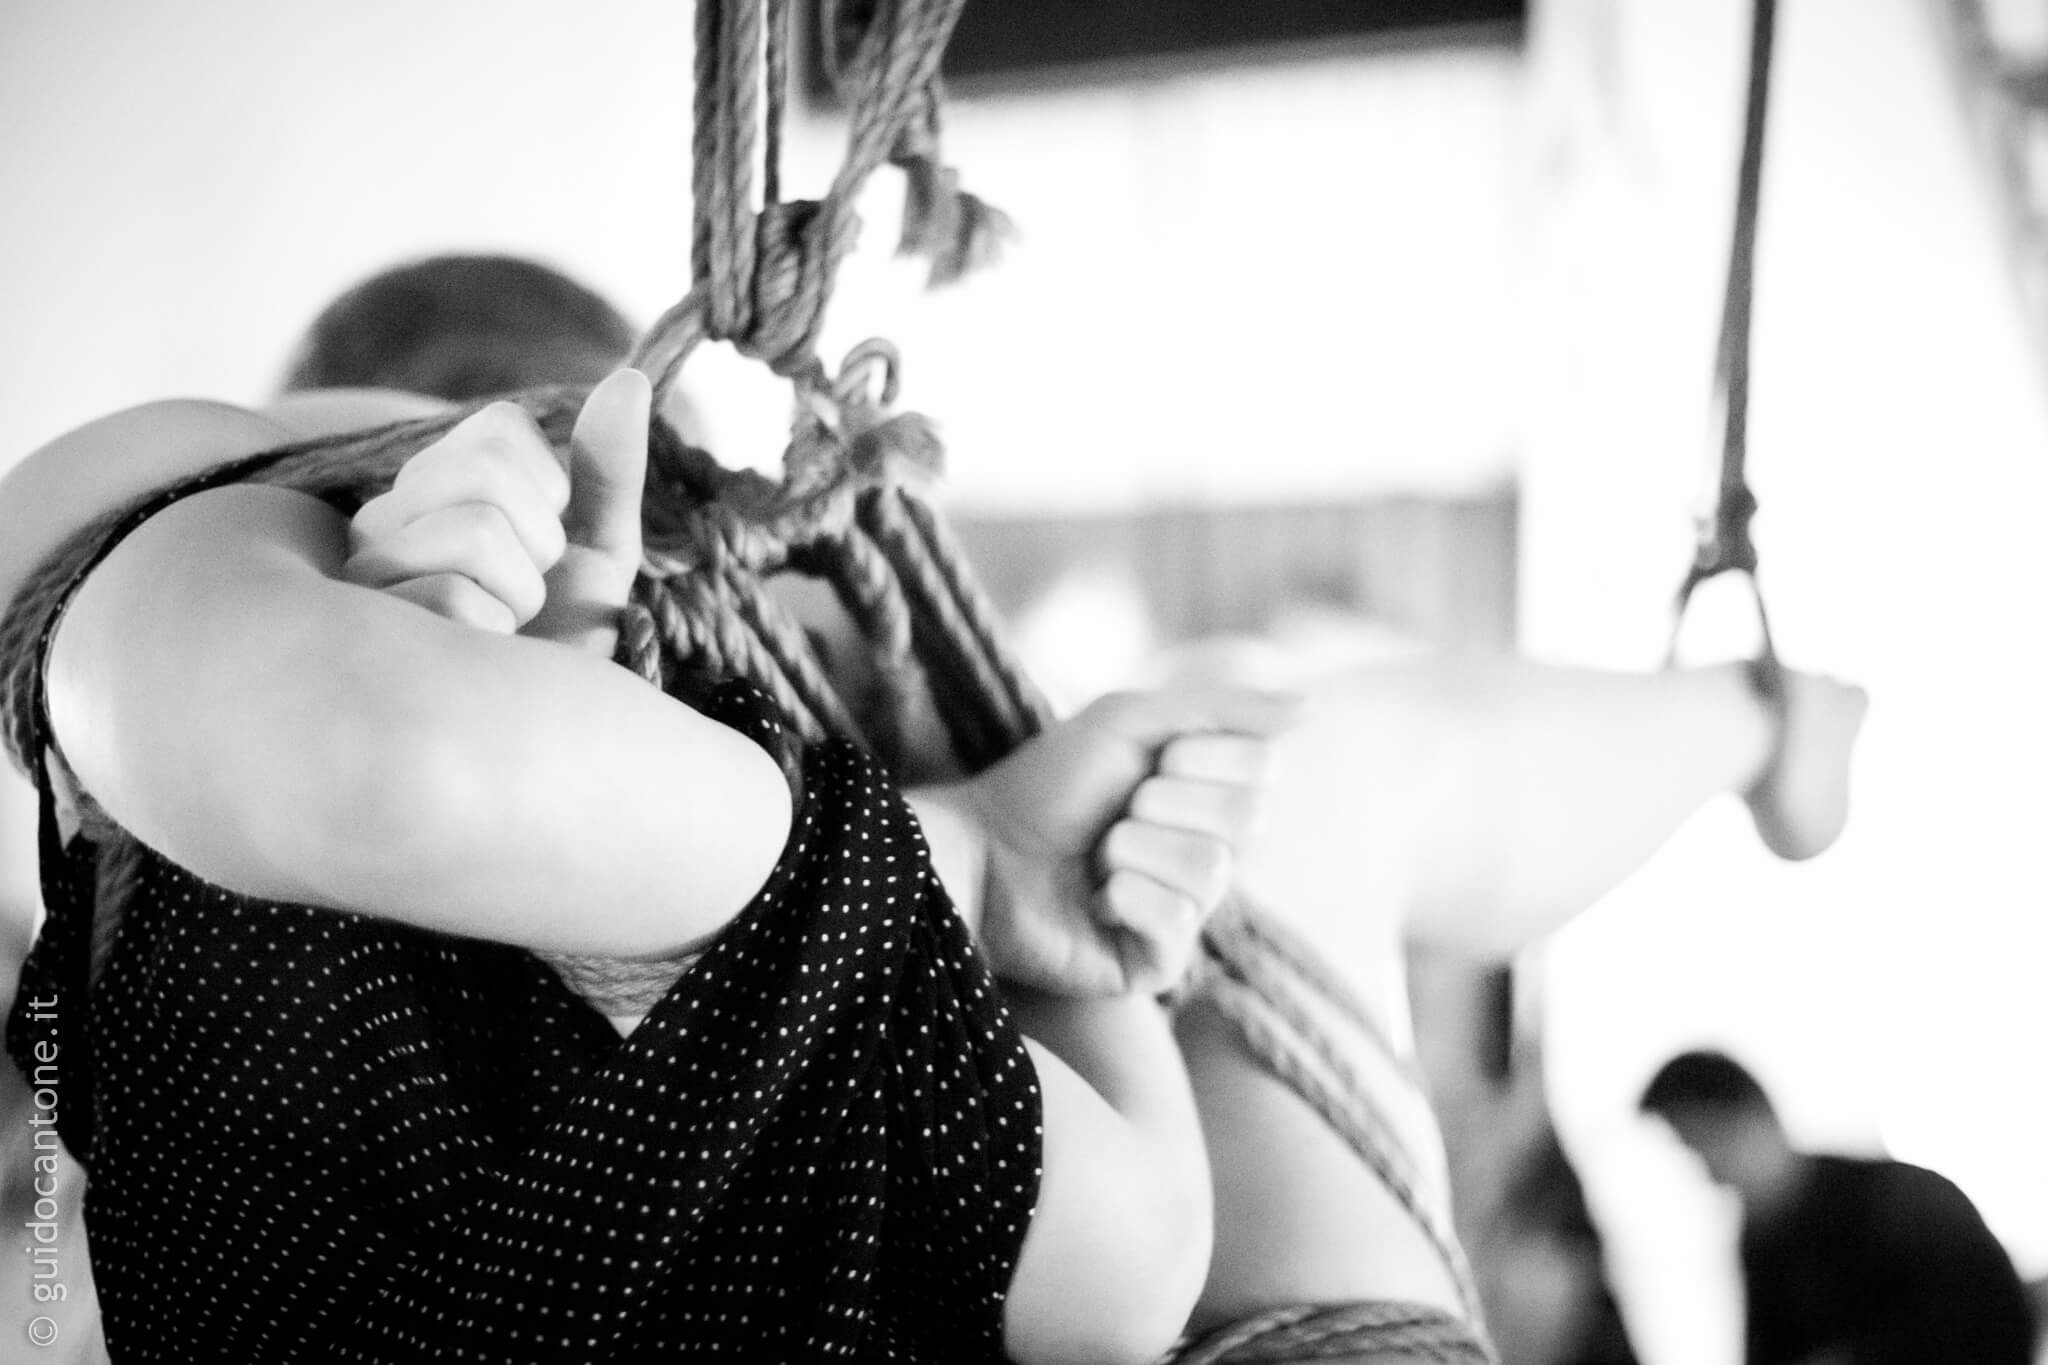 rope-jam-session-milano-bondage-shibari-kinbaku